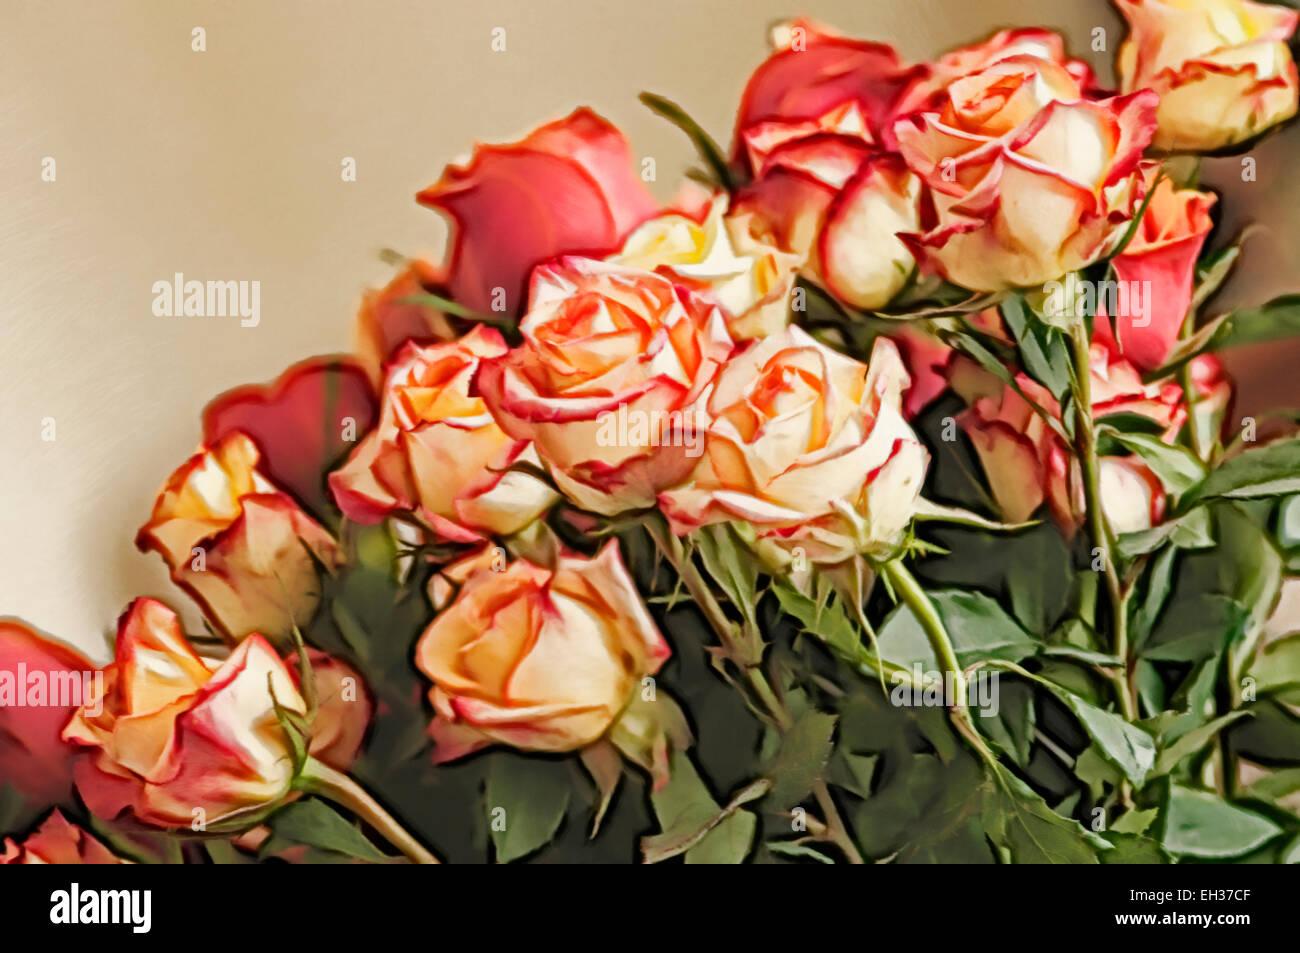 Winter rose flower bouquet Stock Photo: 79362319 - Alamy